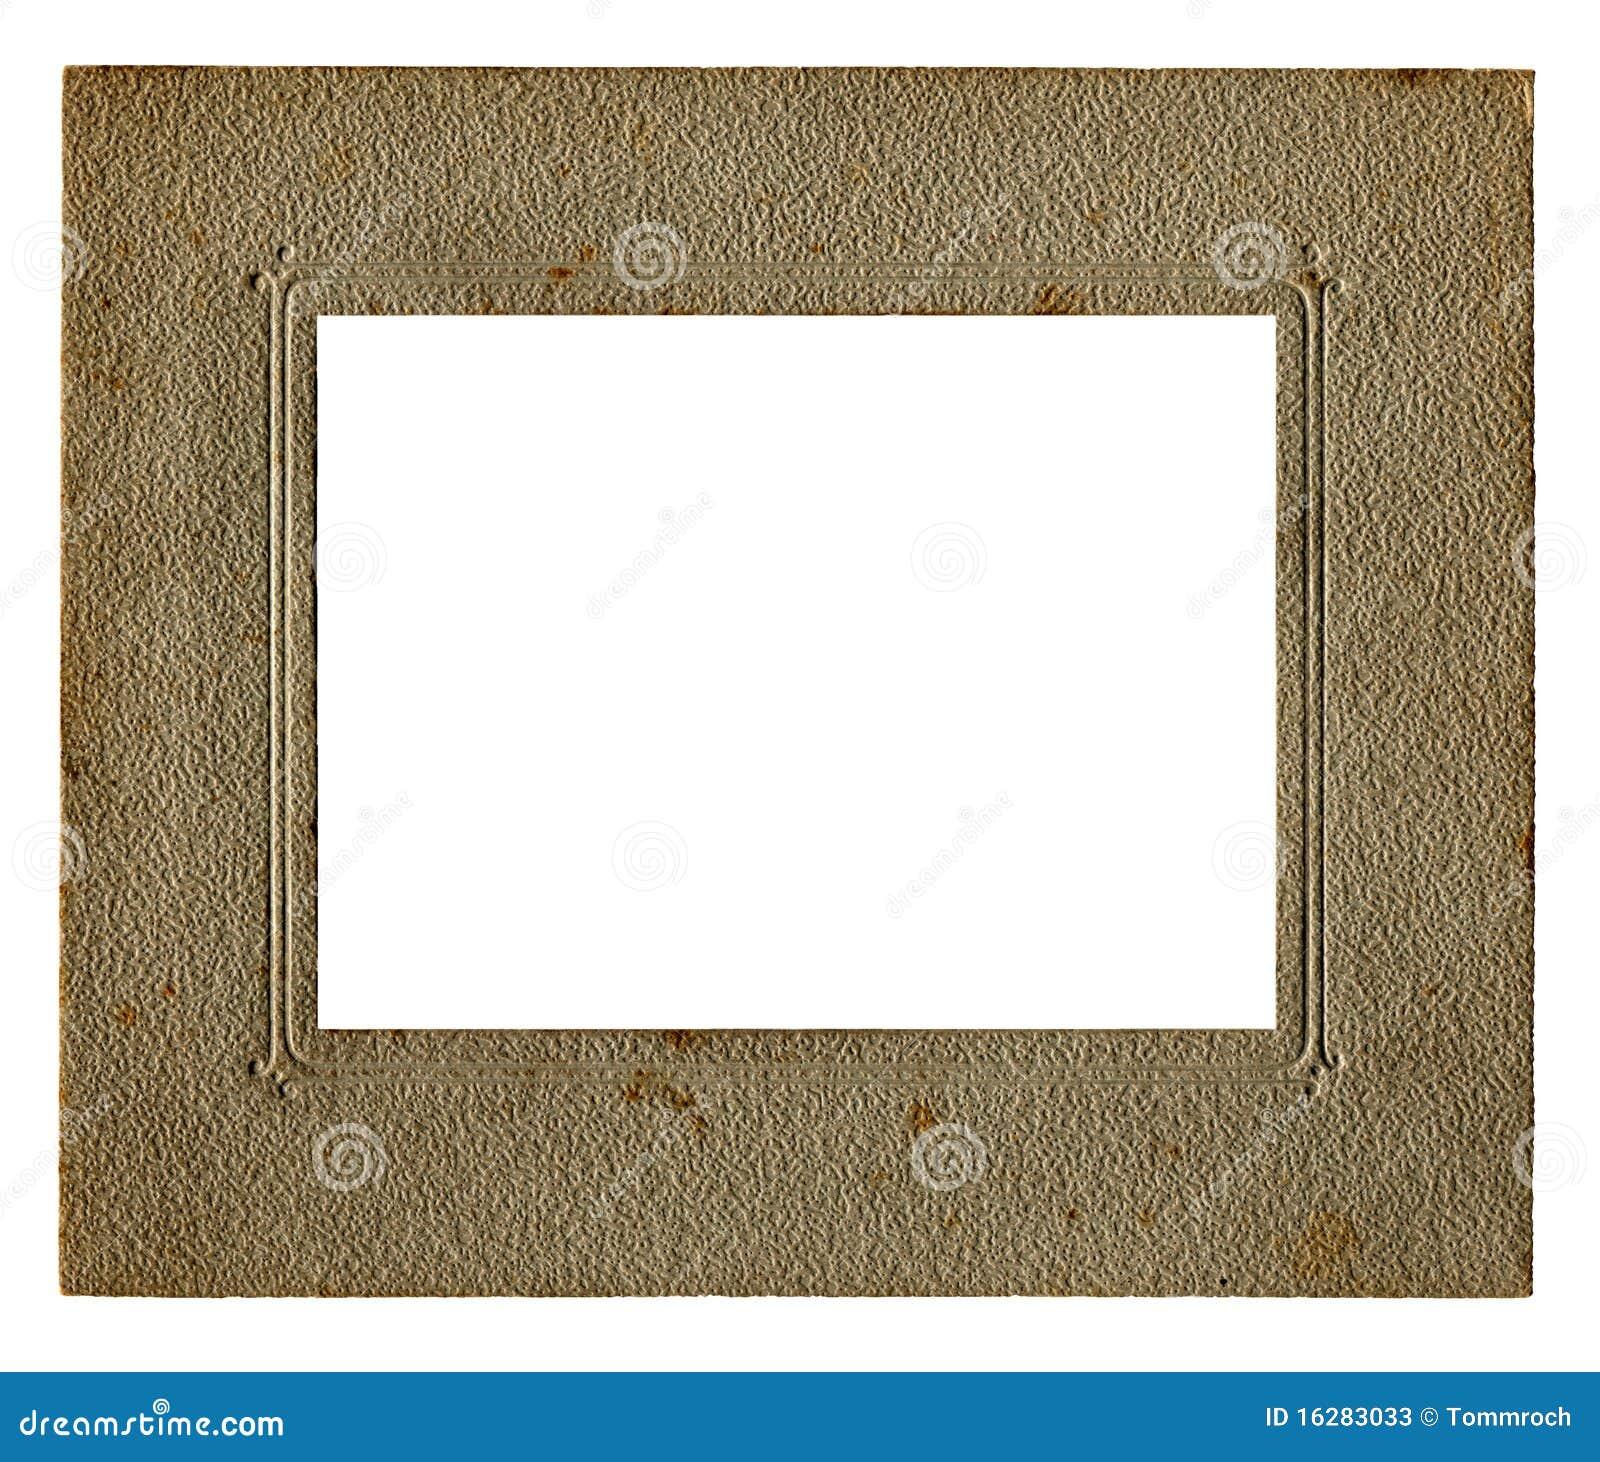 Vintage White Frame : Vintage Picture Frame And White Inner Stock Photos - Image: 16283033